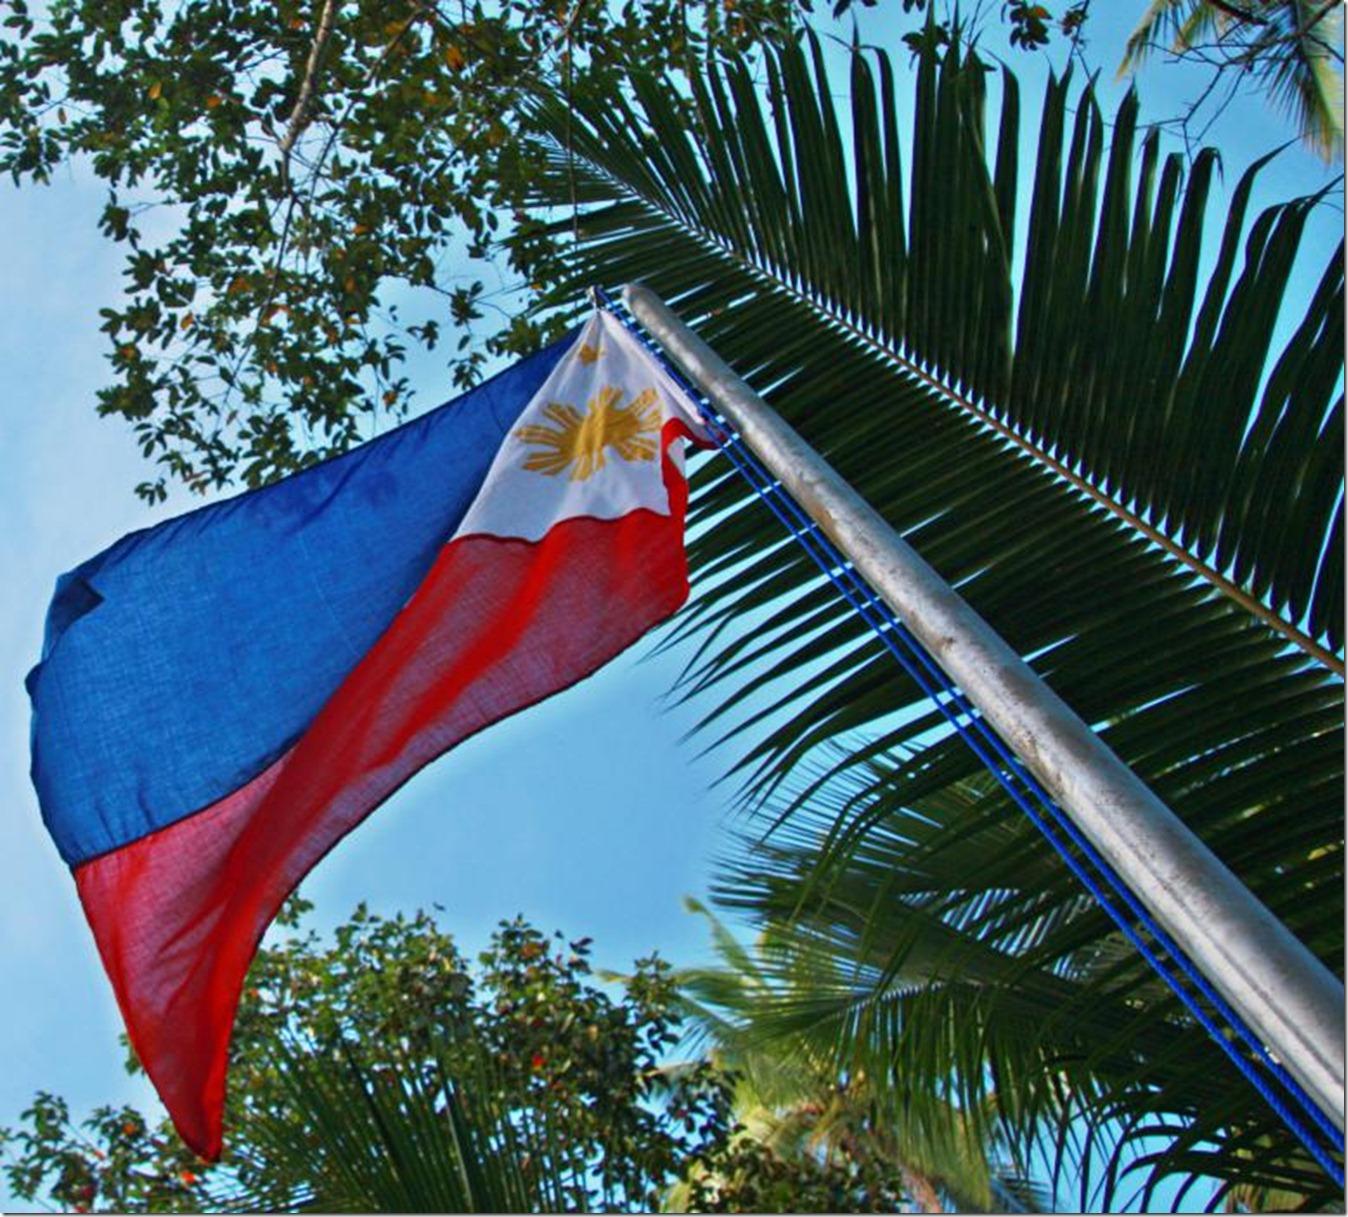 SALDANA FAMILY FLIES THE REPUBLIC OF THE PHILIPPINES FLAG_8424_resized